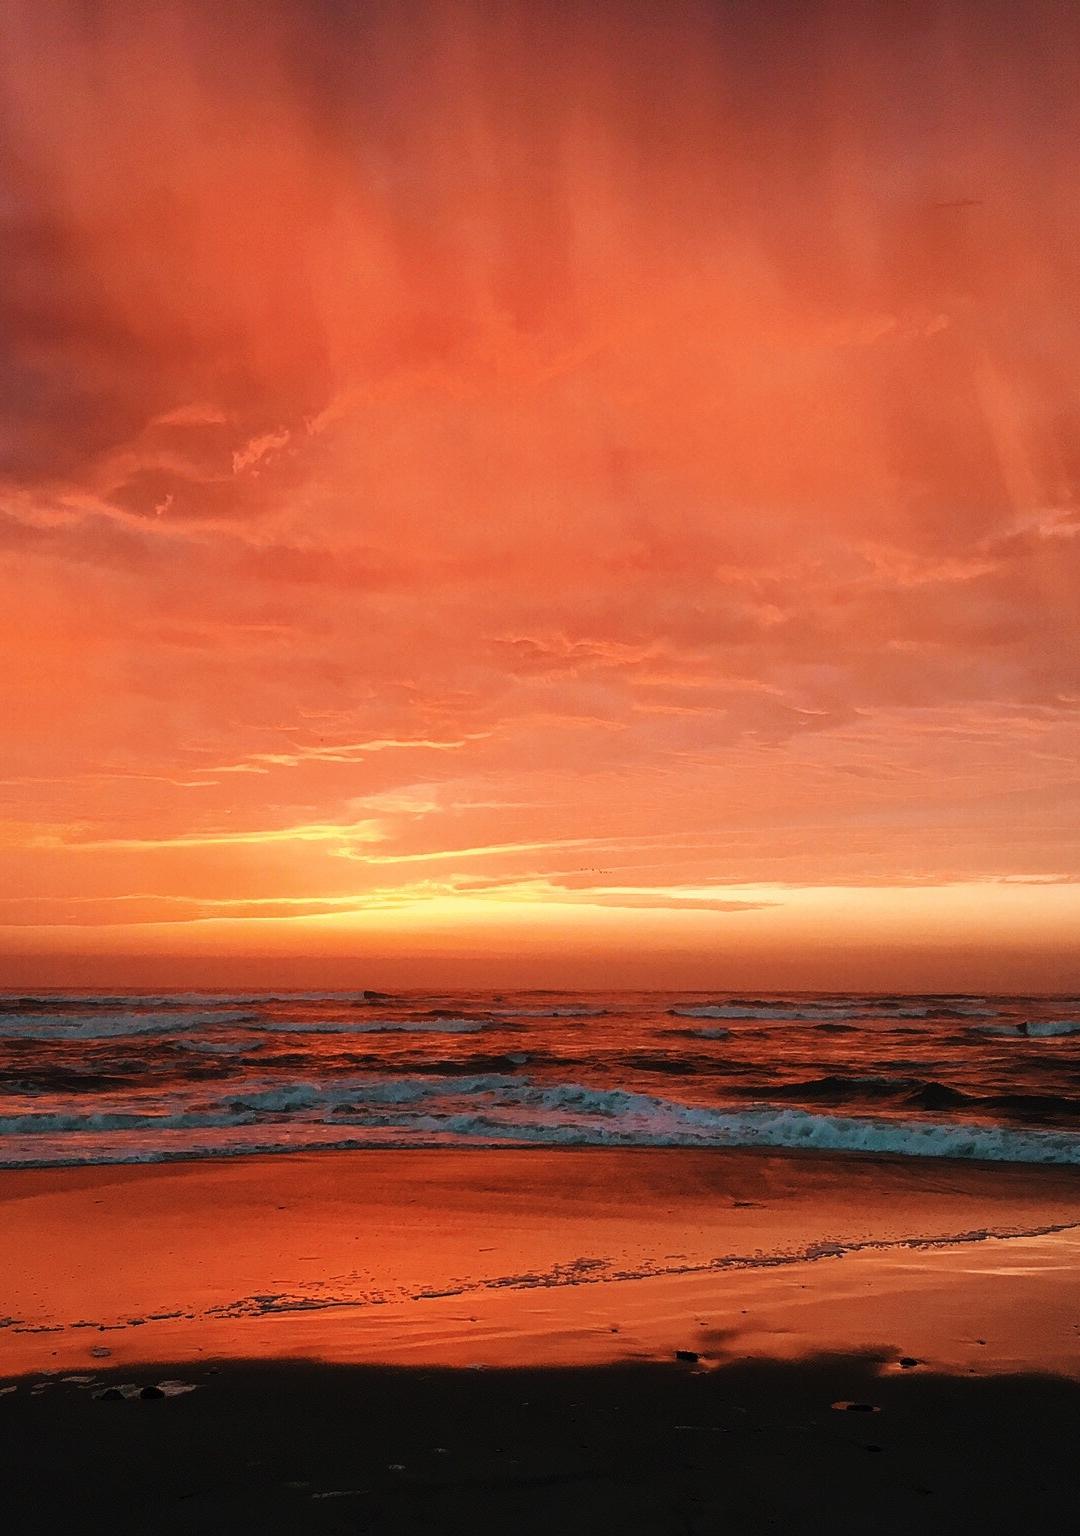 Sunrise HD iPhone Wallpaper